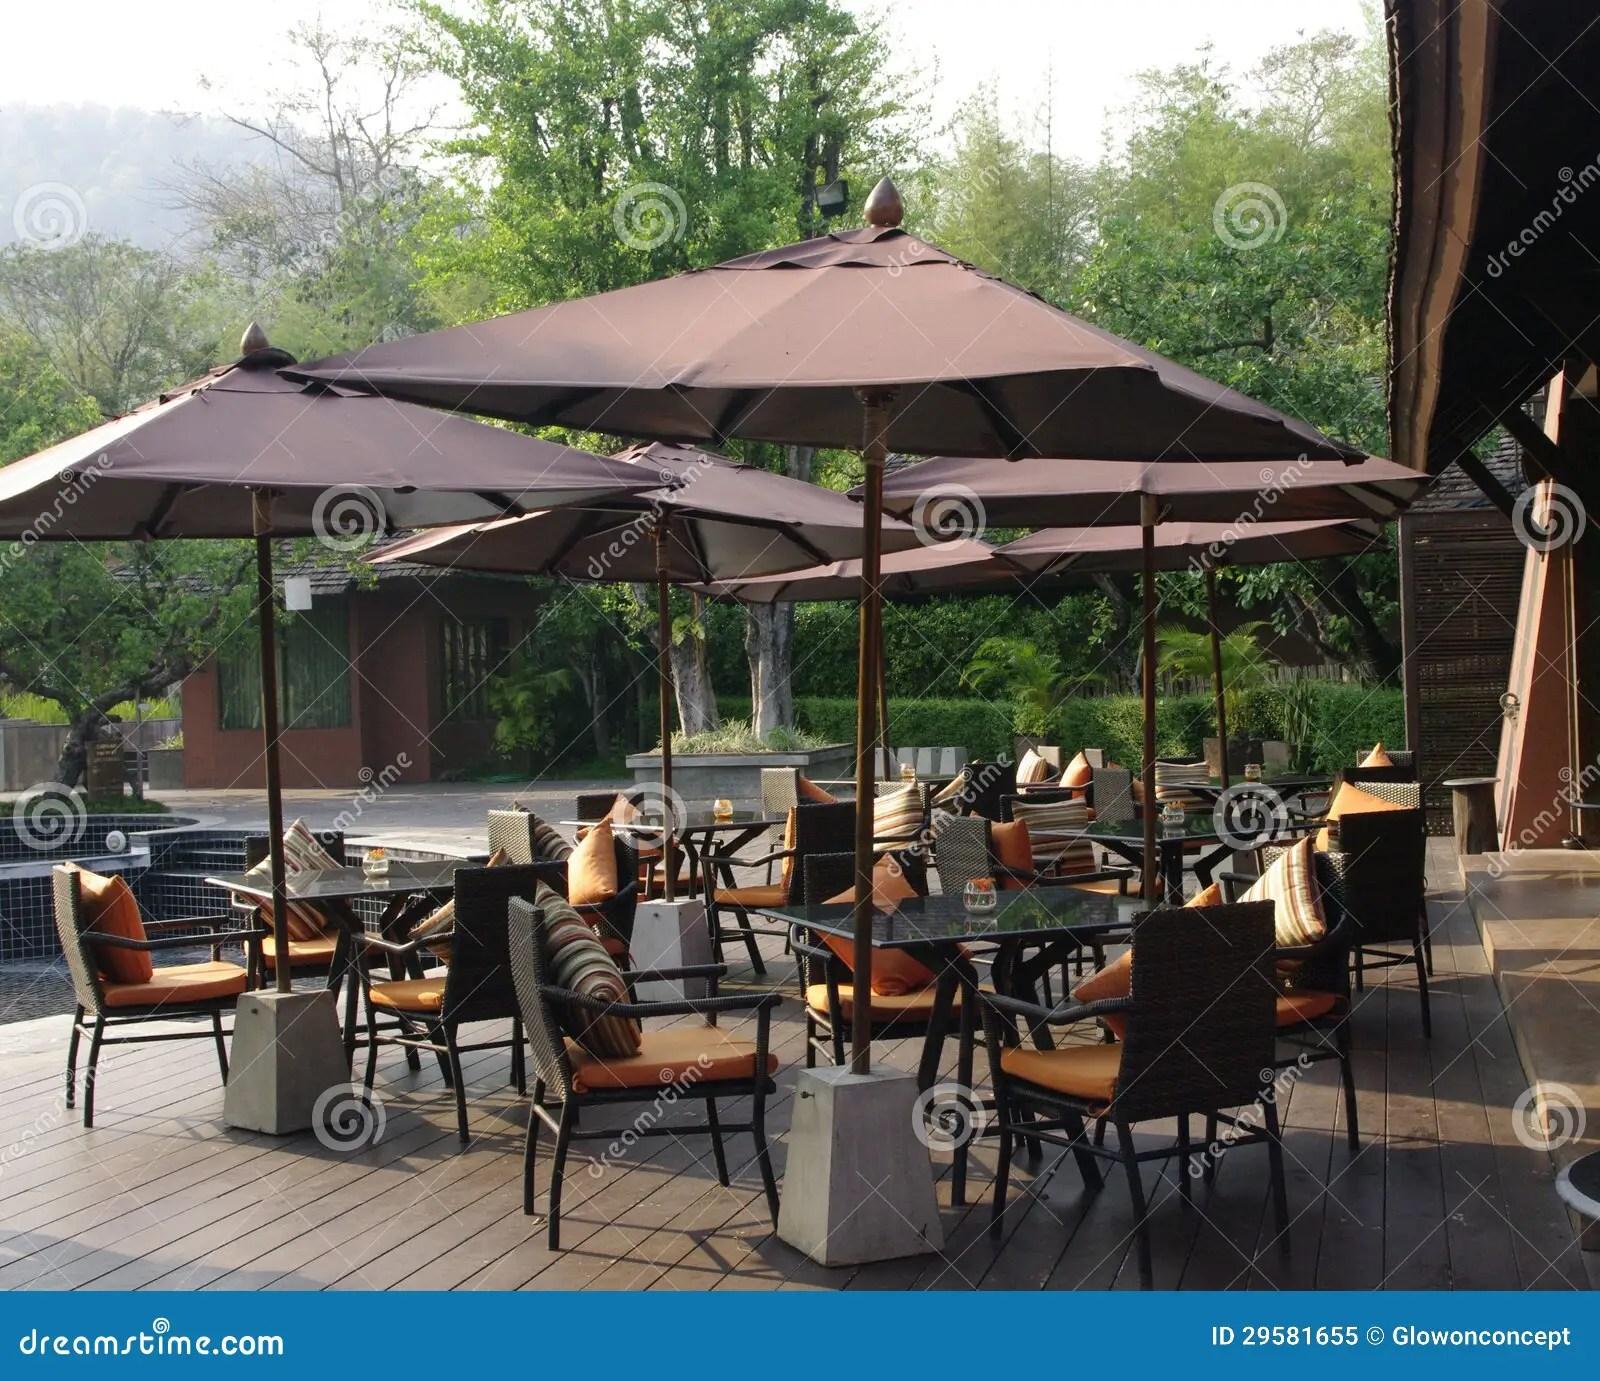 Beautiful Tropical Resort Restaurant Patio Royalty Free